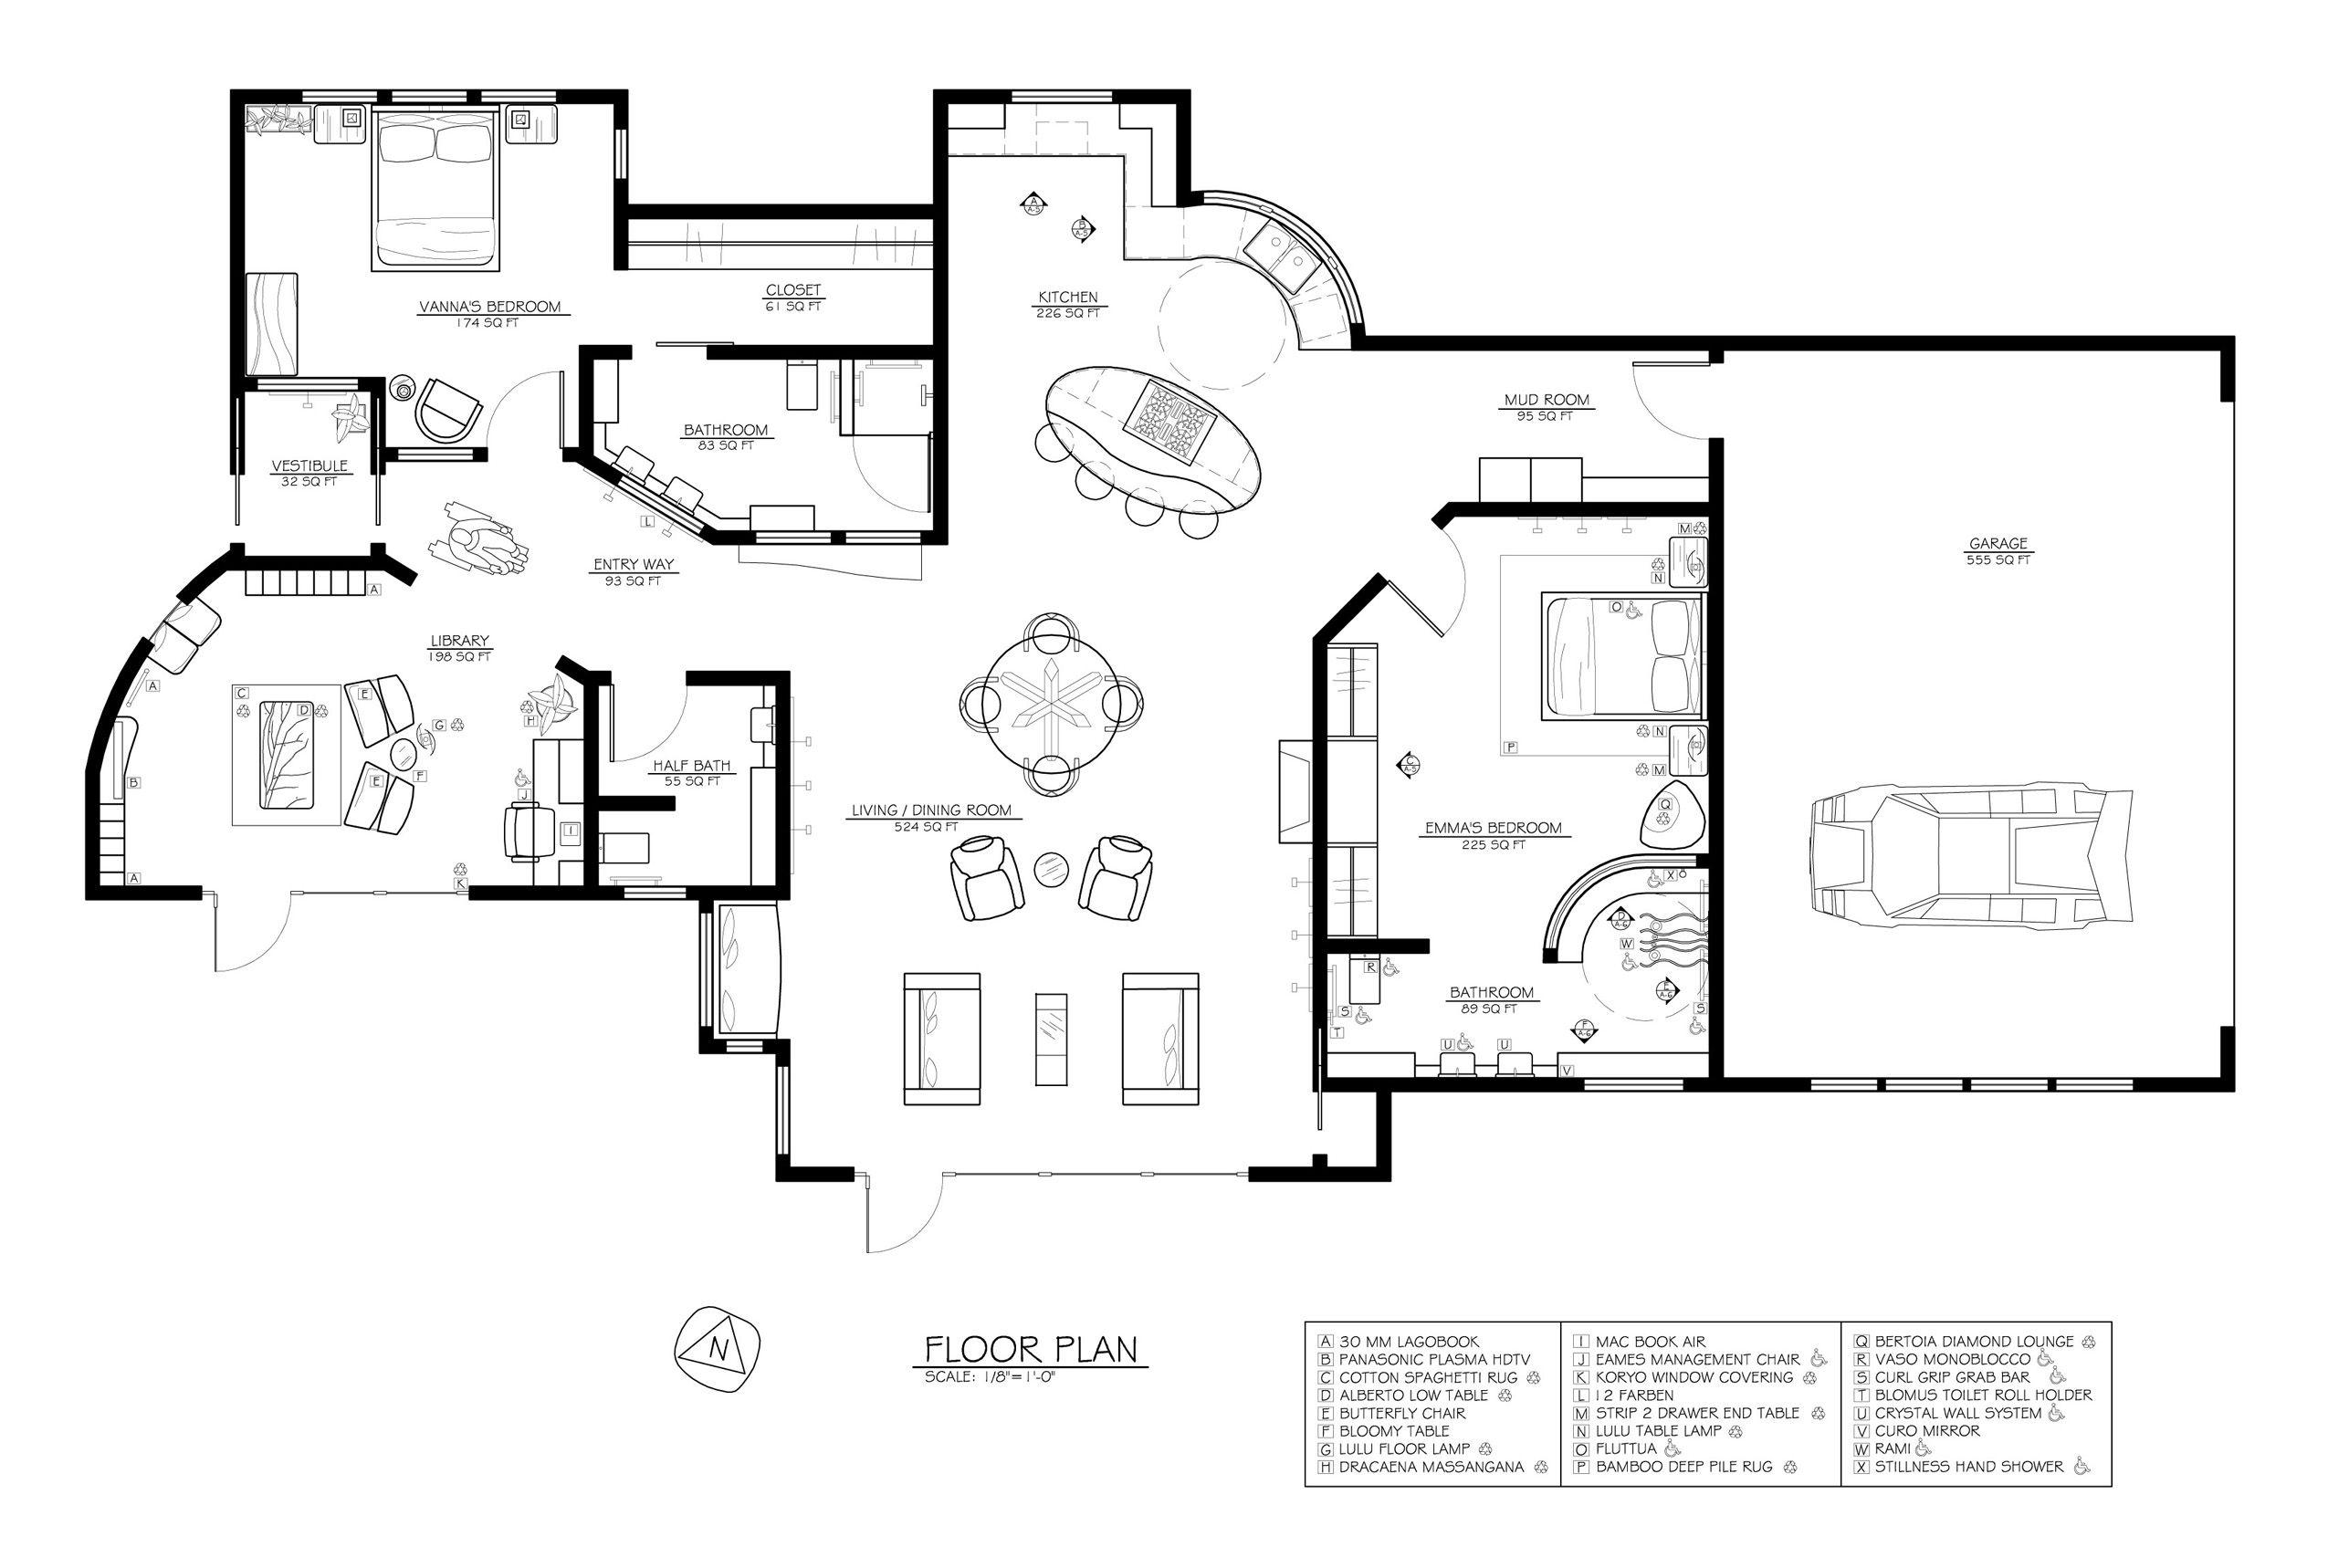 Passive Solar House Plans ADA Plan 1 Bedroom Pinterest House